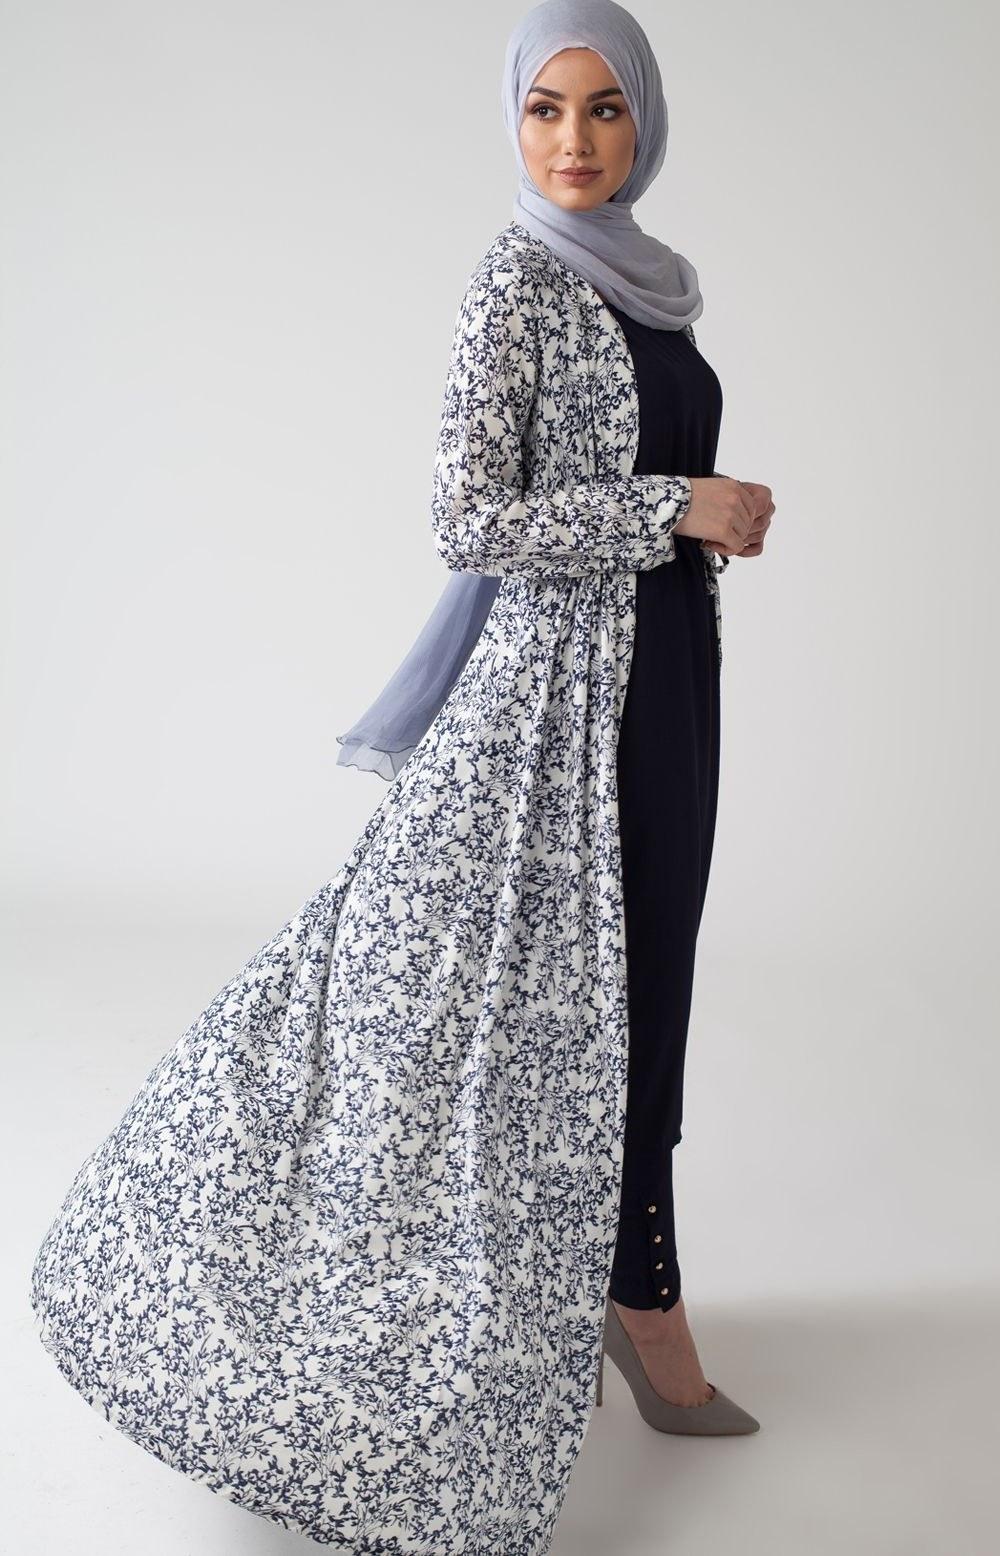 Ide Fashion Muslimah Drdp Blue Ivy Kimono What S New 2017